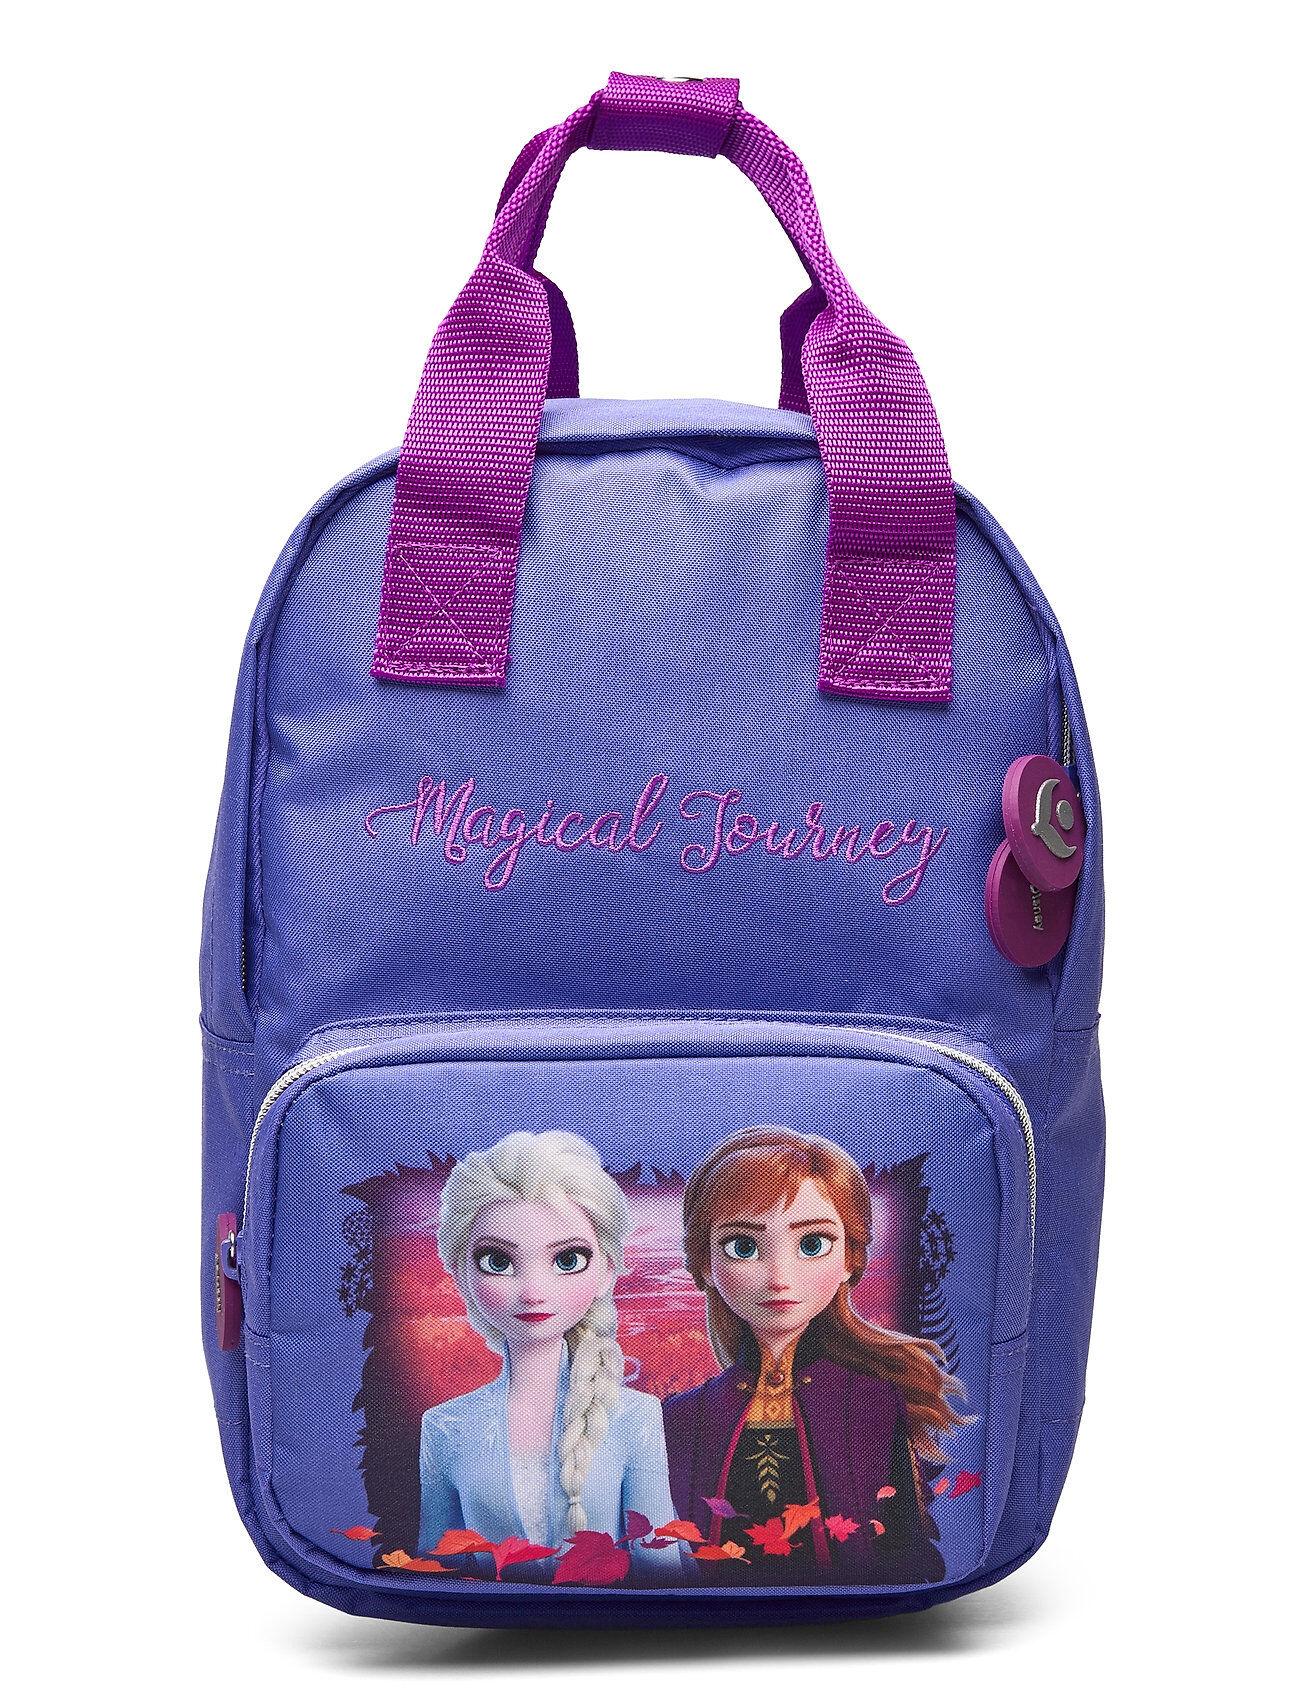 Disney Frozen 2 Small Backpack Accessories Bags Backpacks Liila Disney Frozen